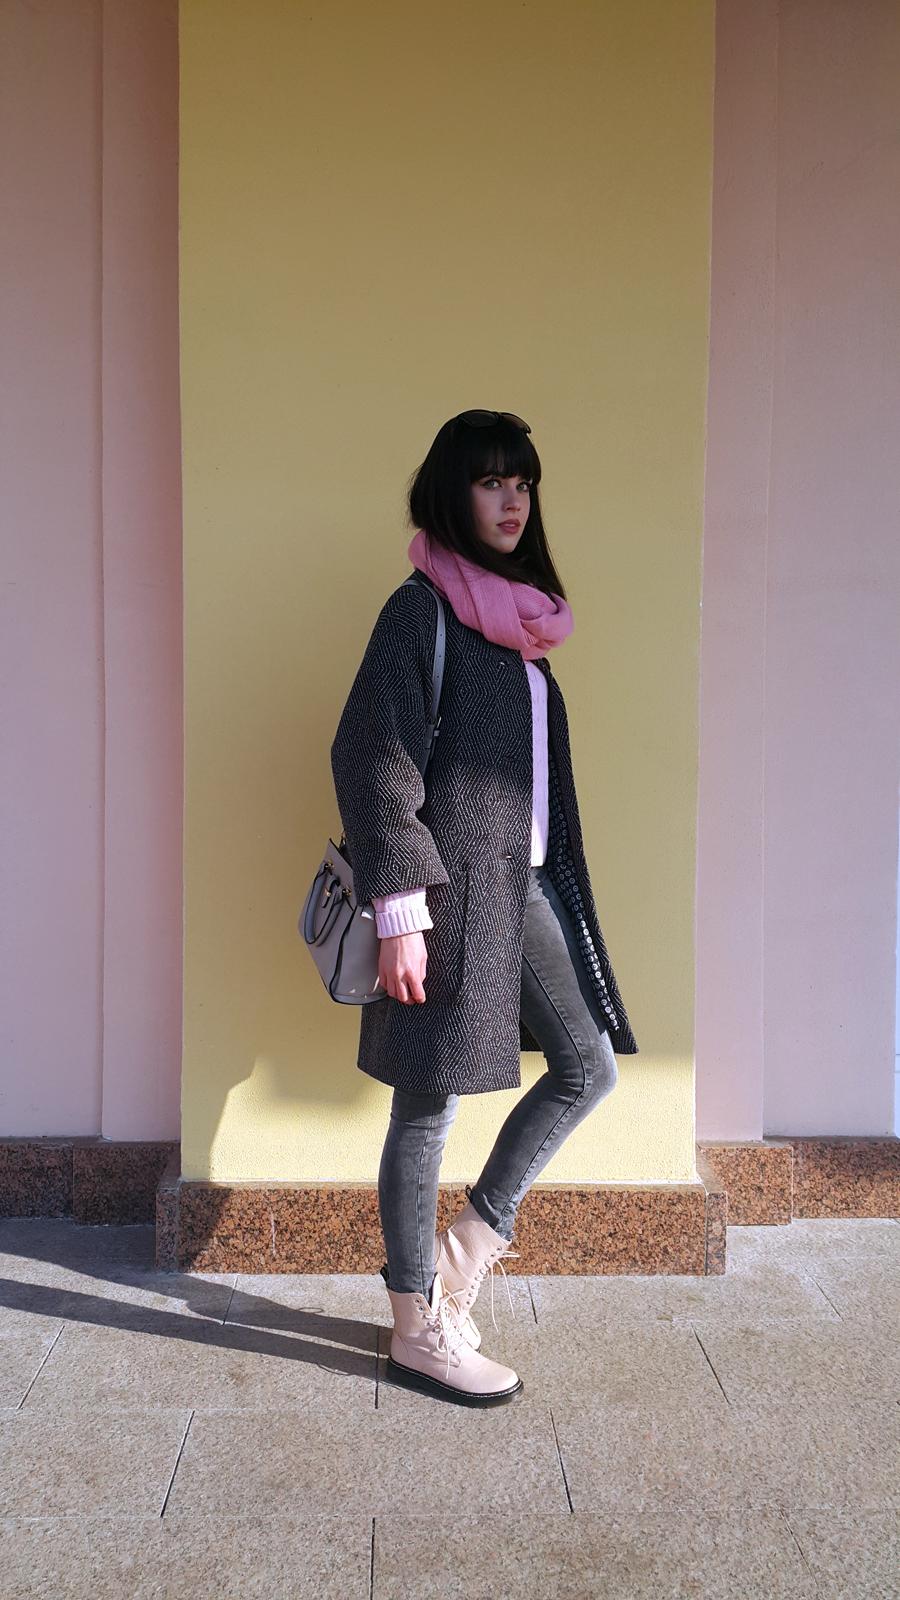 пальто оверсайз, с чем носить пальто оверсайз